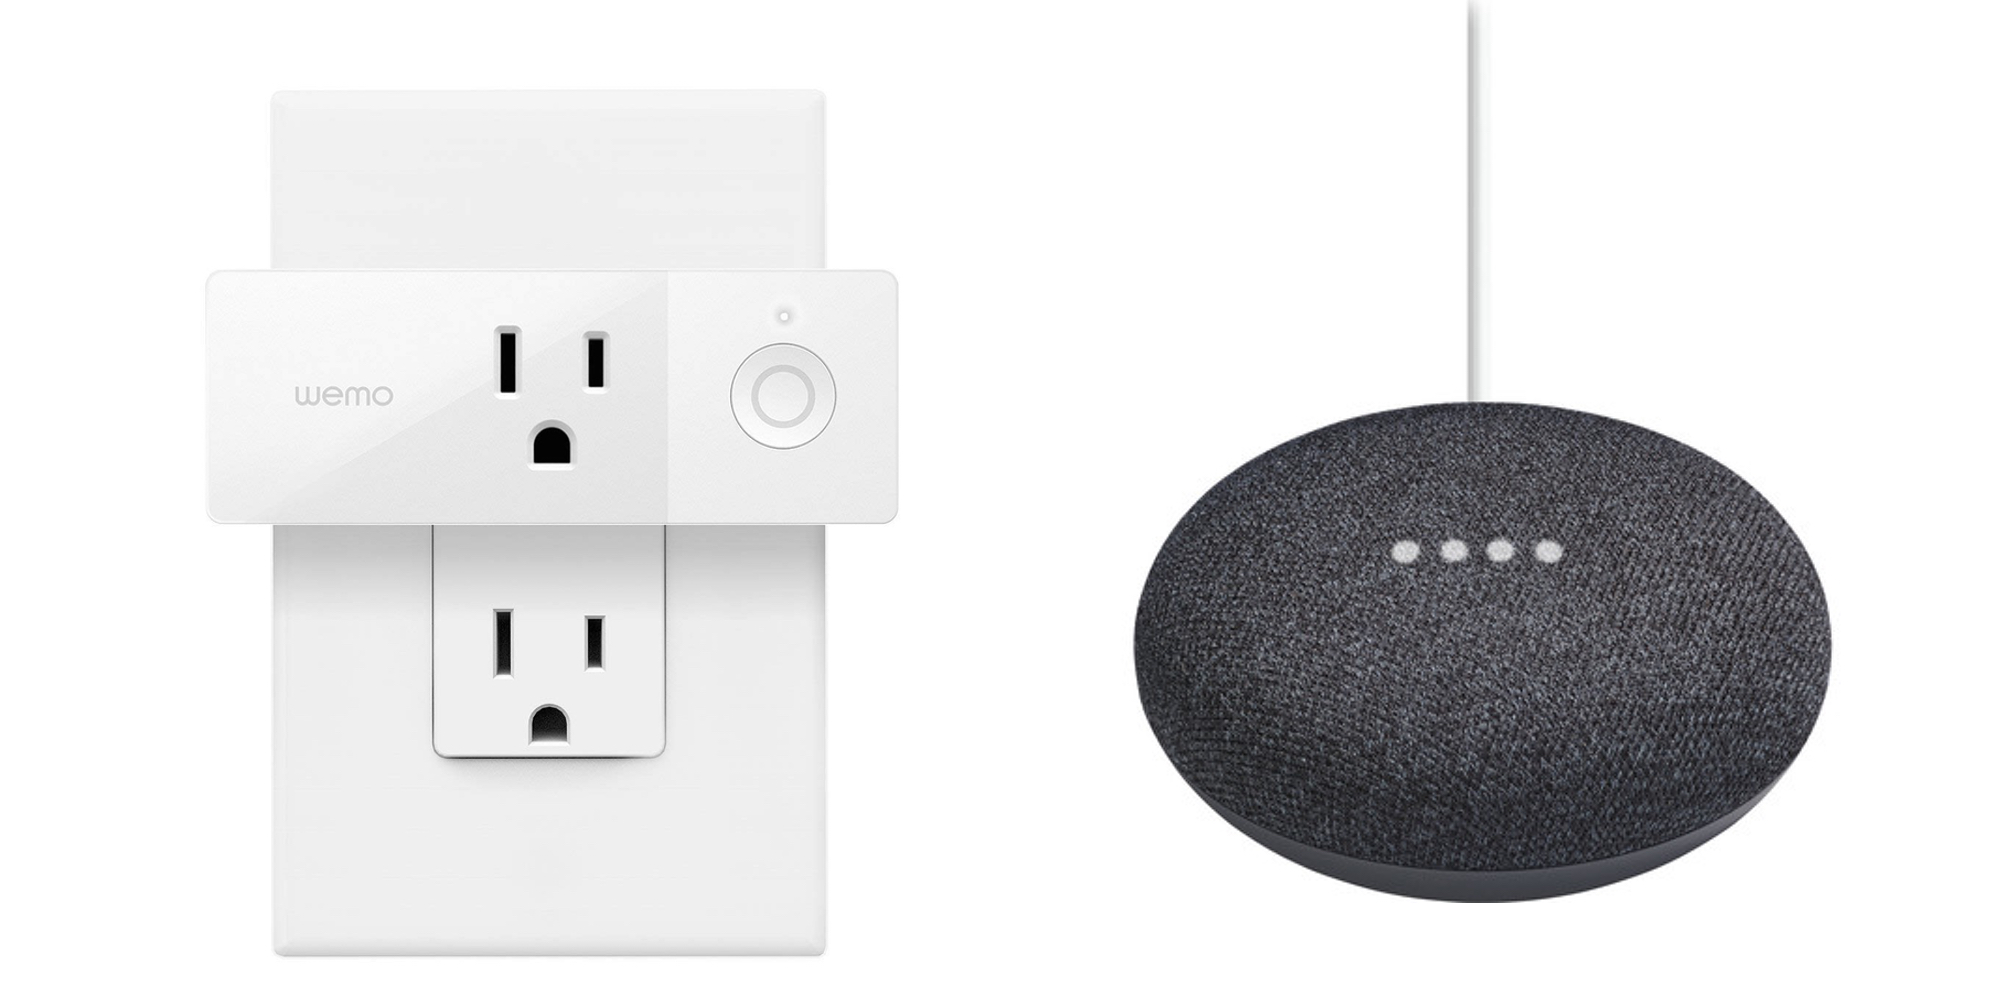 9to5Toys Letzter Anruf: Samsung Wireless-Ladegerät Duo 50, Home Mini & Wemo Smart Plug 29, iOttie One Touch 4 Mount 17, mehr